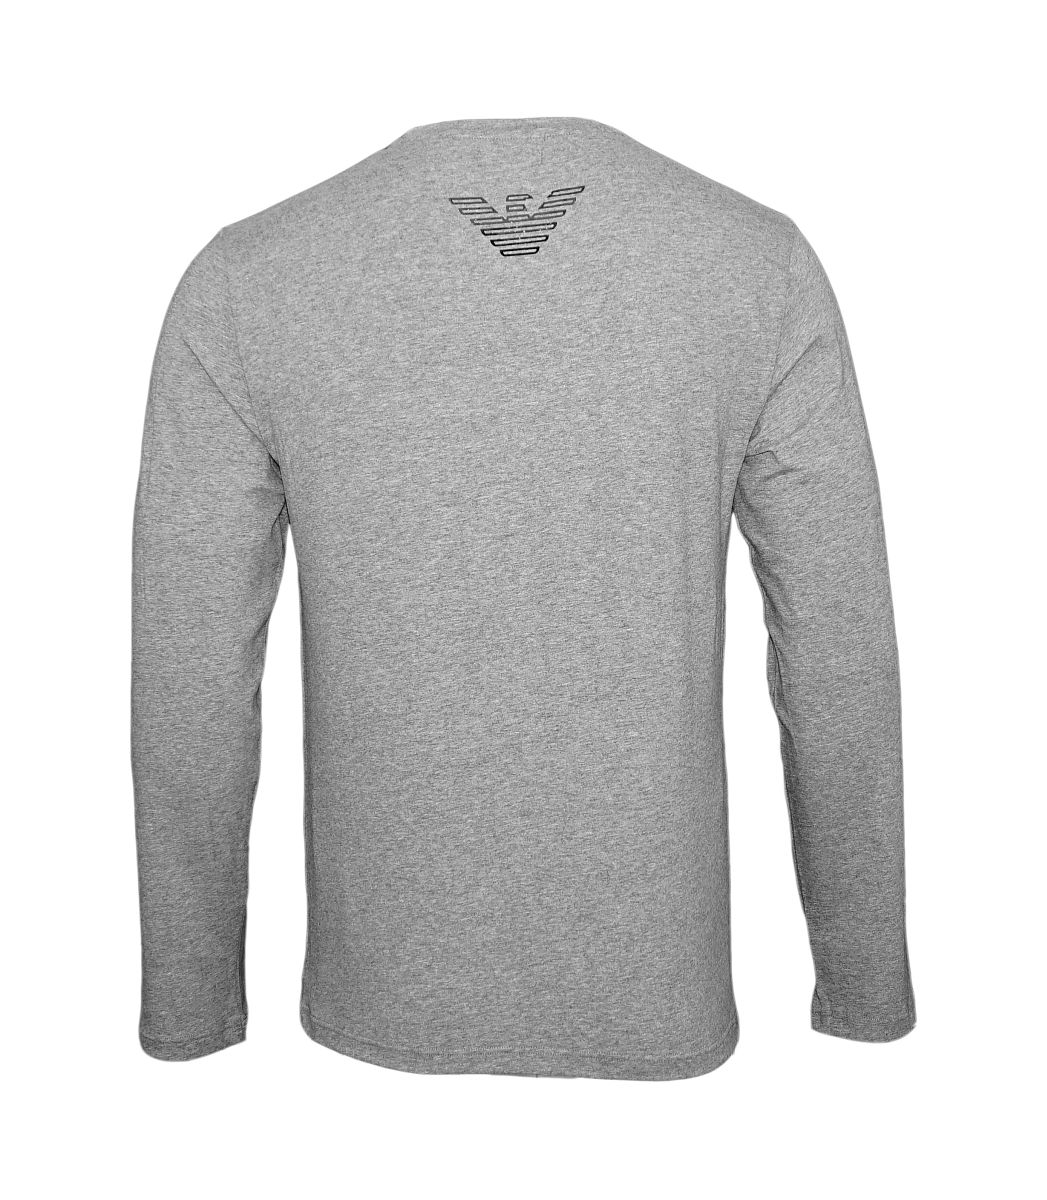 Emporio Armani Longsleeve Sweater Rundhals 111653 7A595 06749 GRIGIO MELANGE SCURO HW17-AS1